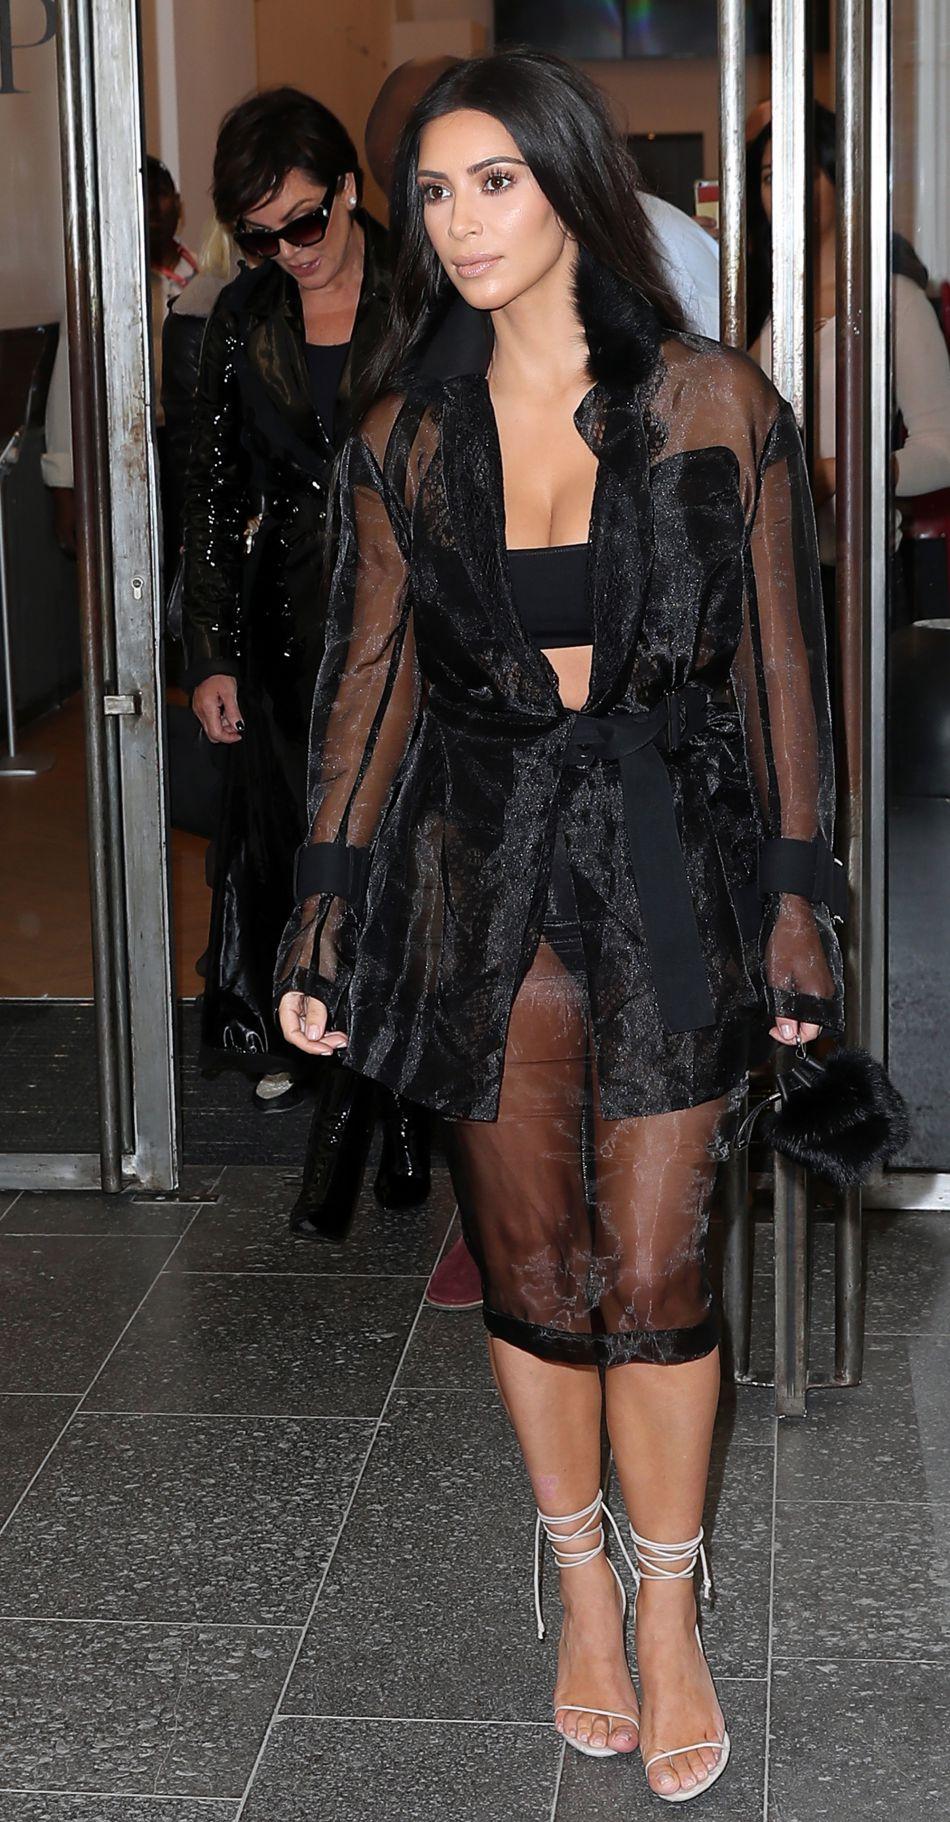 Kim Kardashian dans sa tenue totalement transparente, le mercredi 28 septembre à Paris.